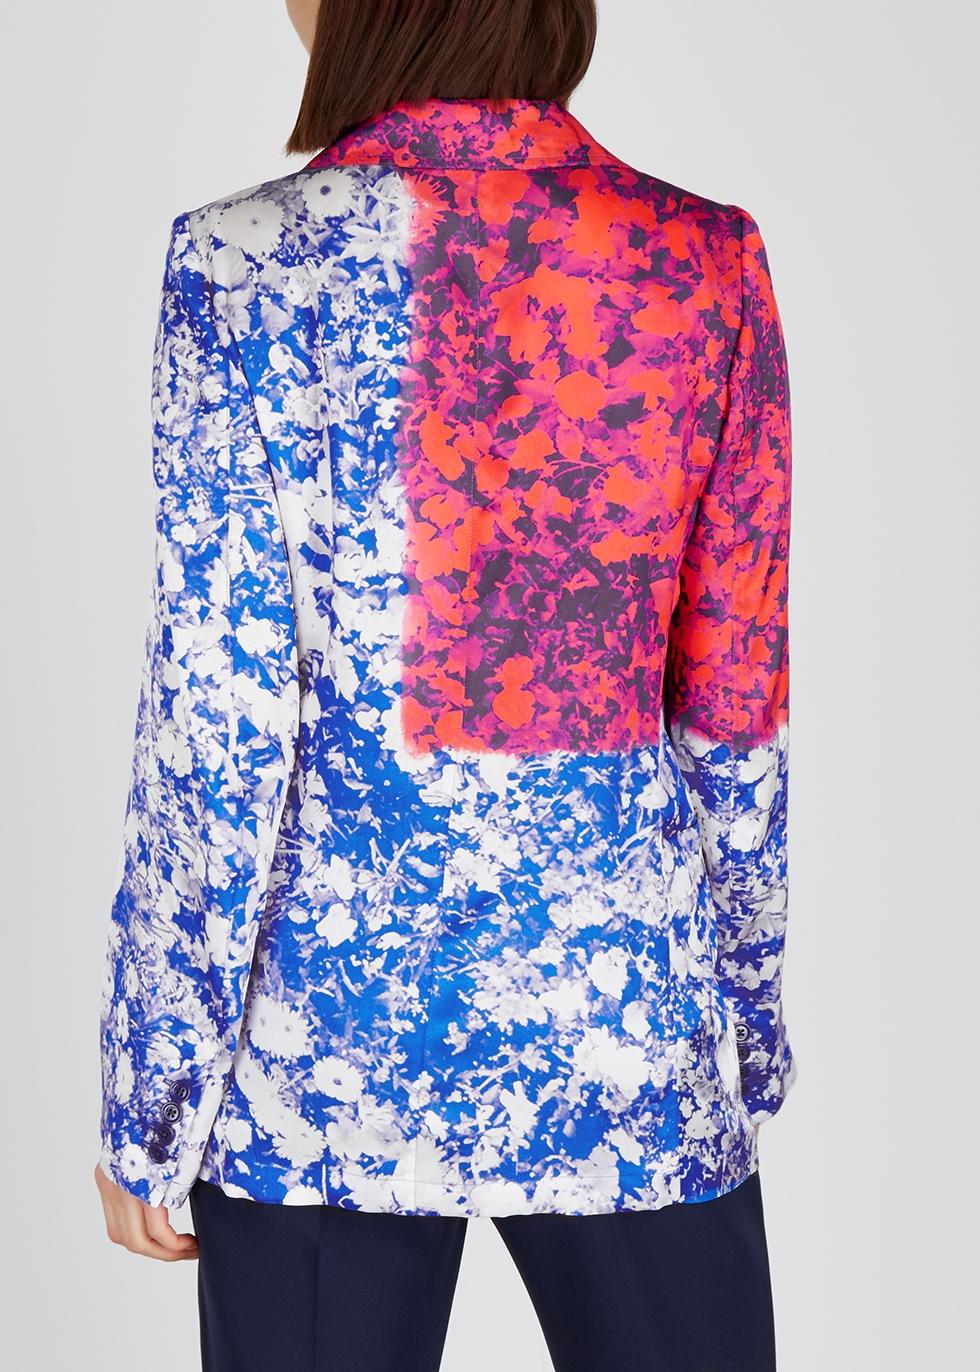 Bondovi printed satin jacket - Dries Van Noten